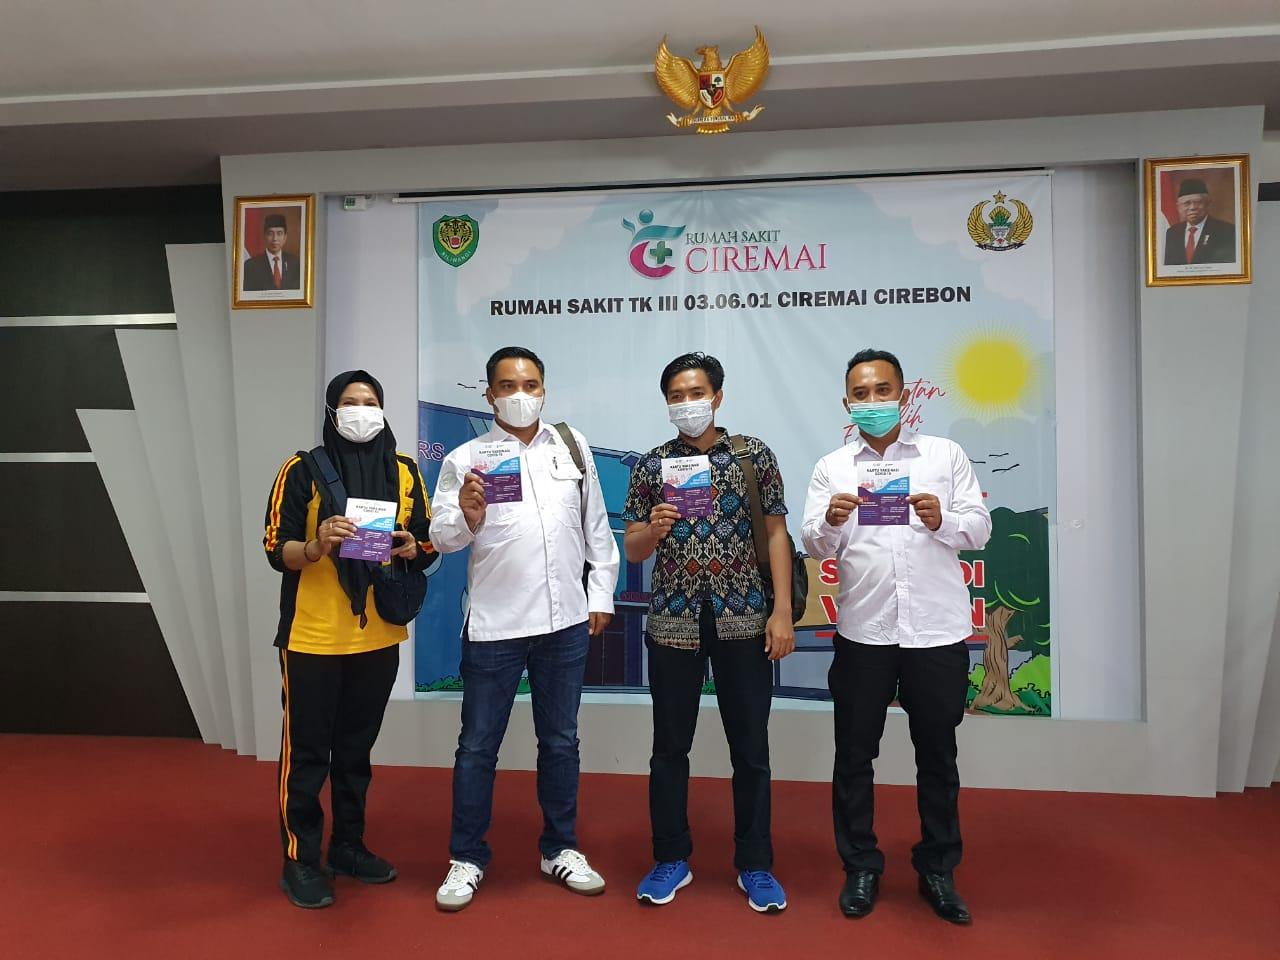 200 Personil Polres Ciko Jalani Suntik Vaksinasi Covid-19 Tahap Pertama